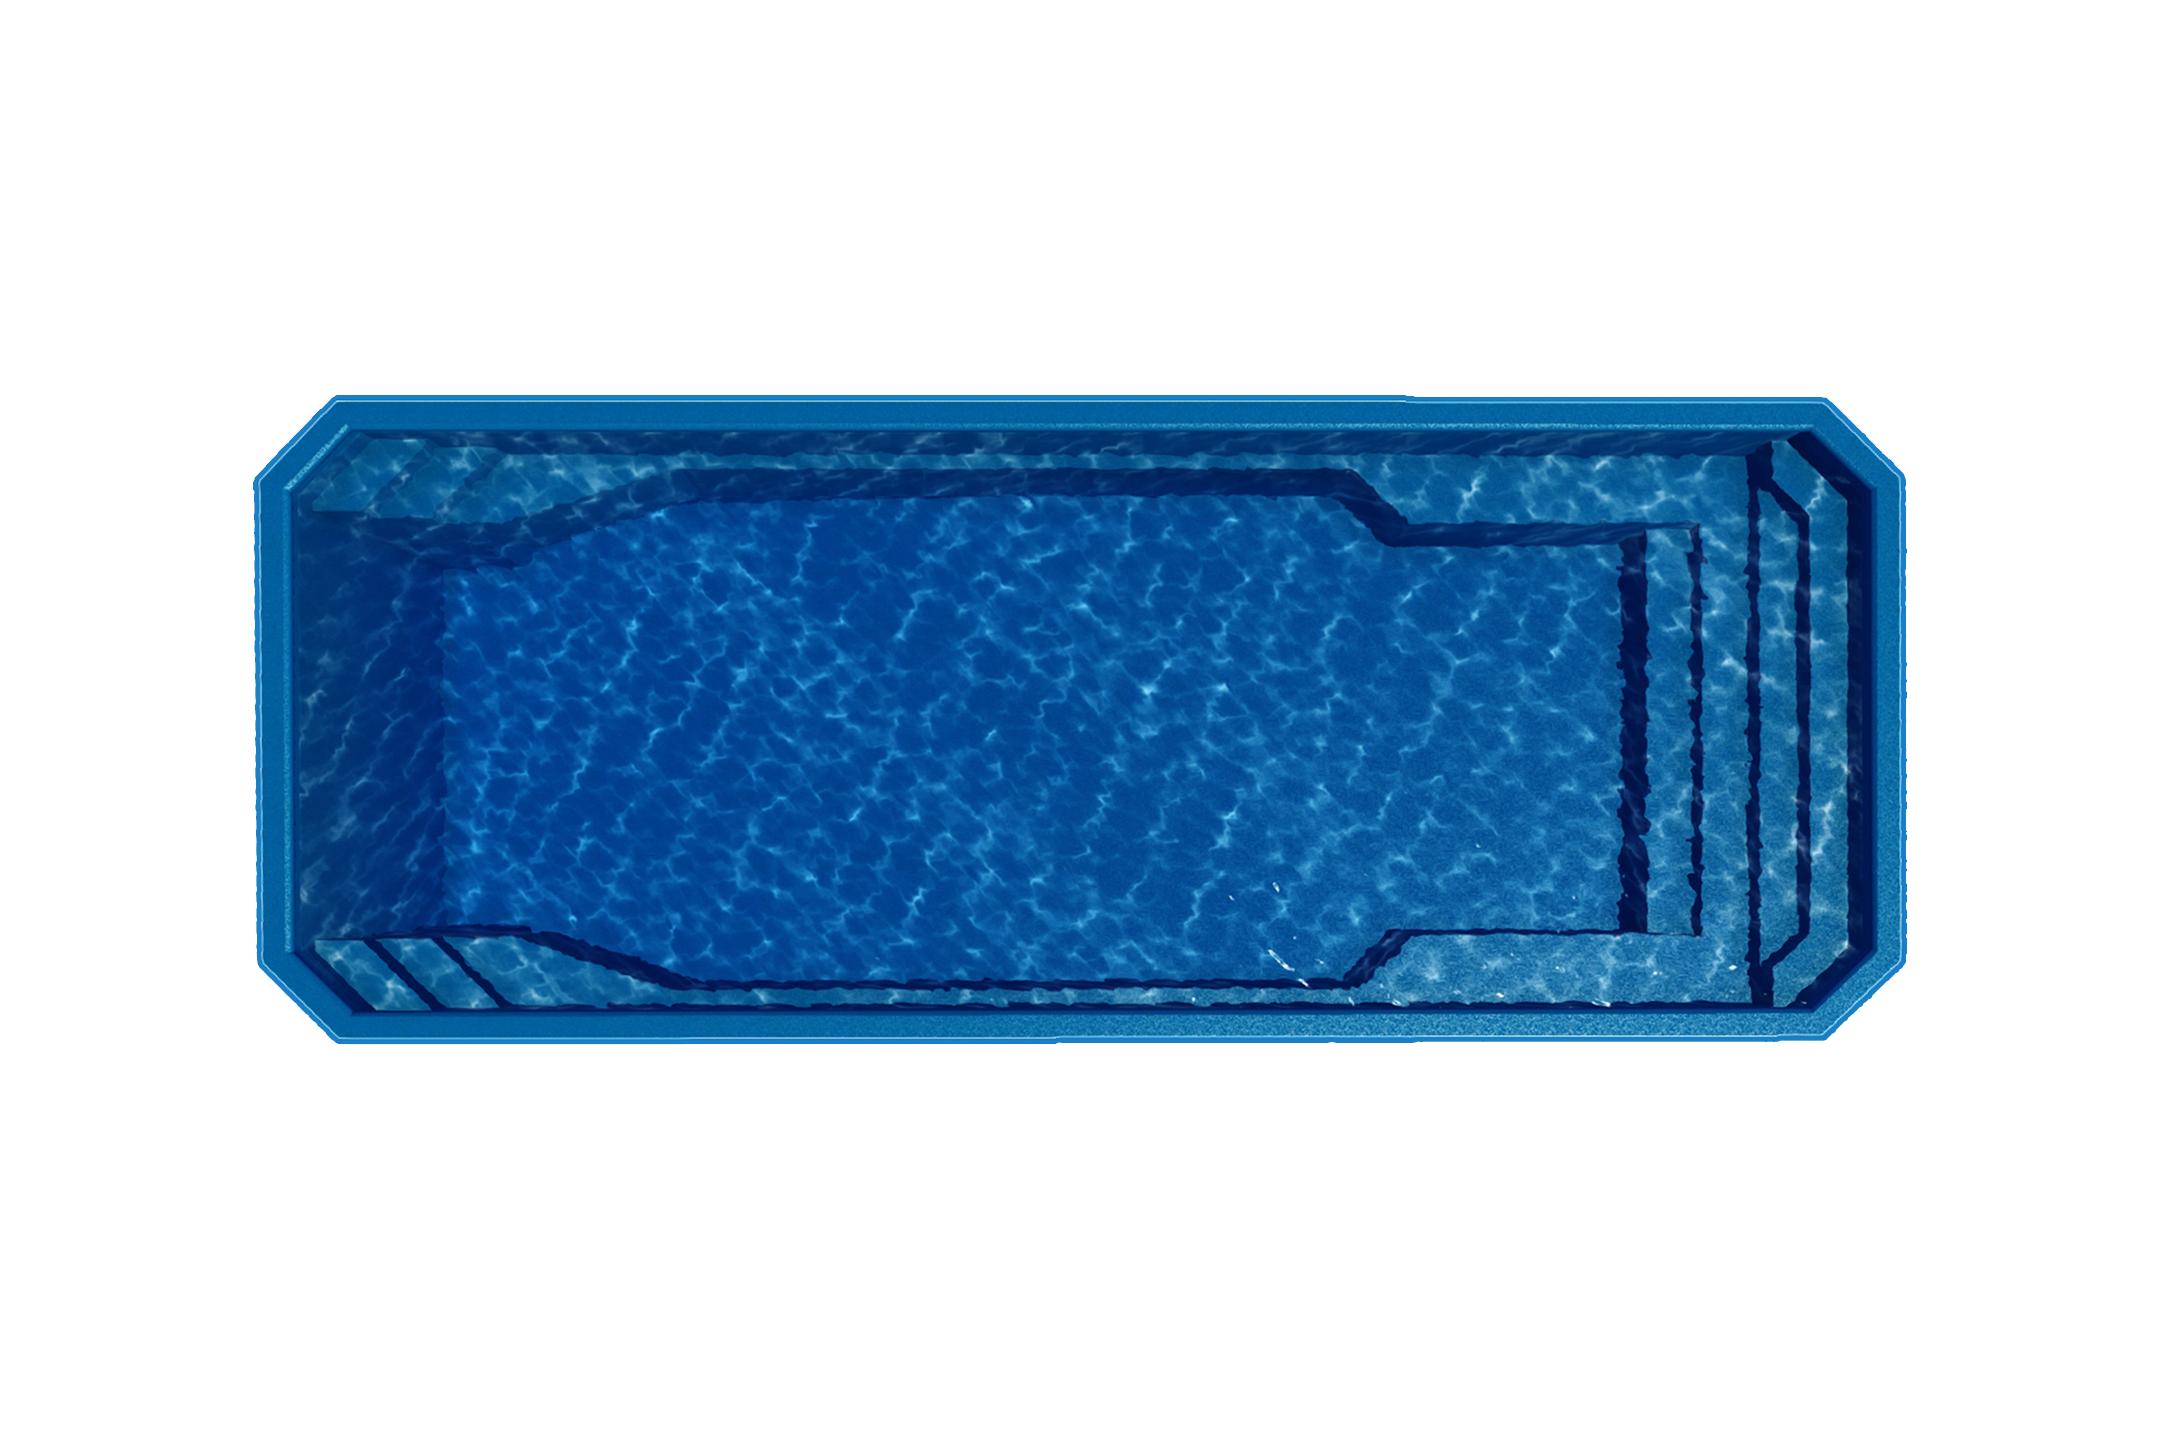 fiberglass pool - pool builder in boerne